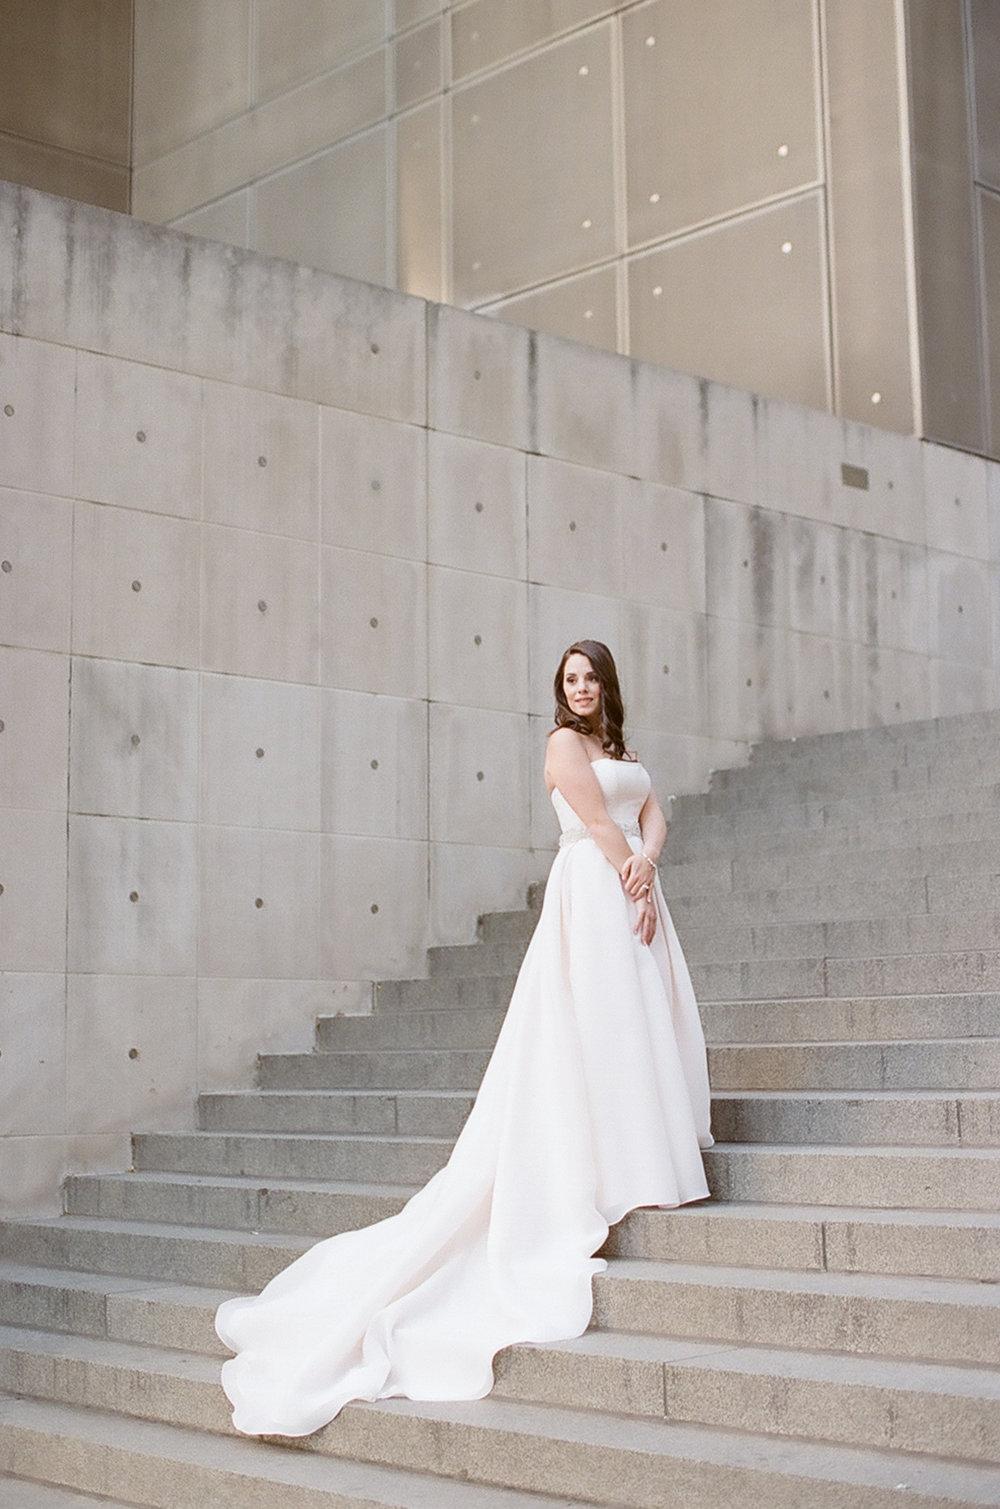 Bonphotage Chicago Fine Art Wedding Photography - Ritz Carlton Chicago